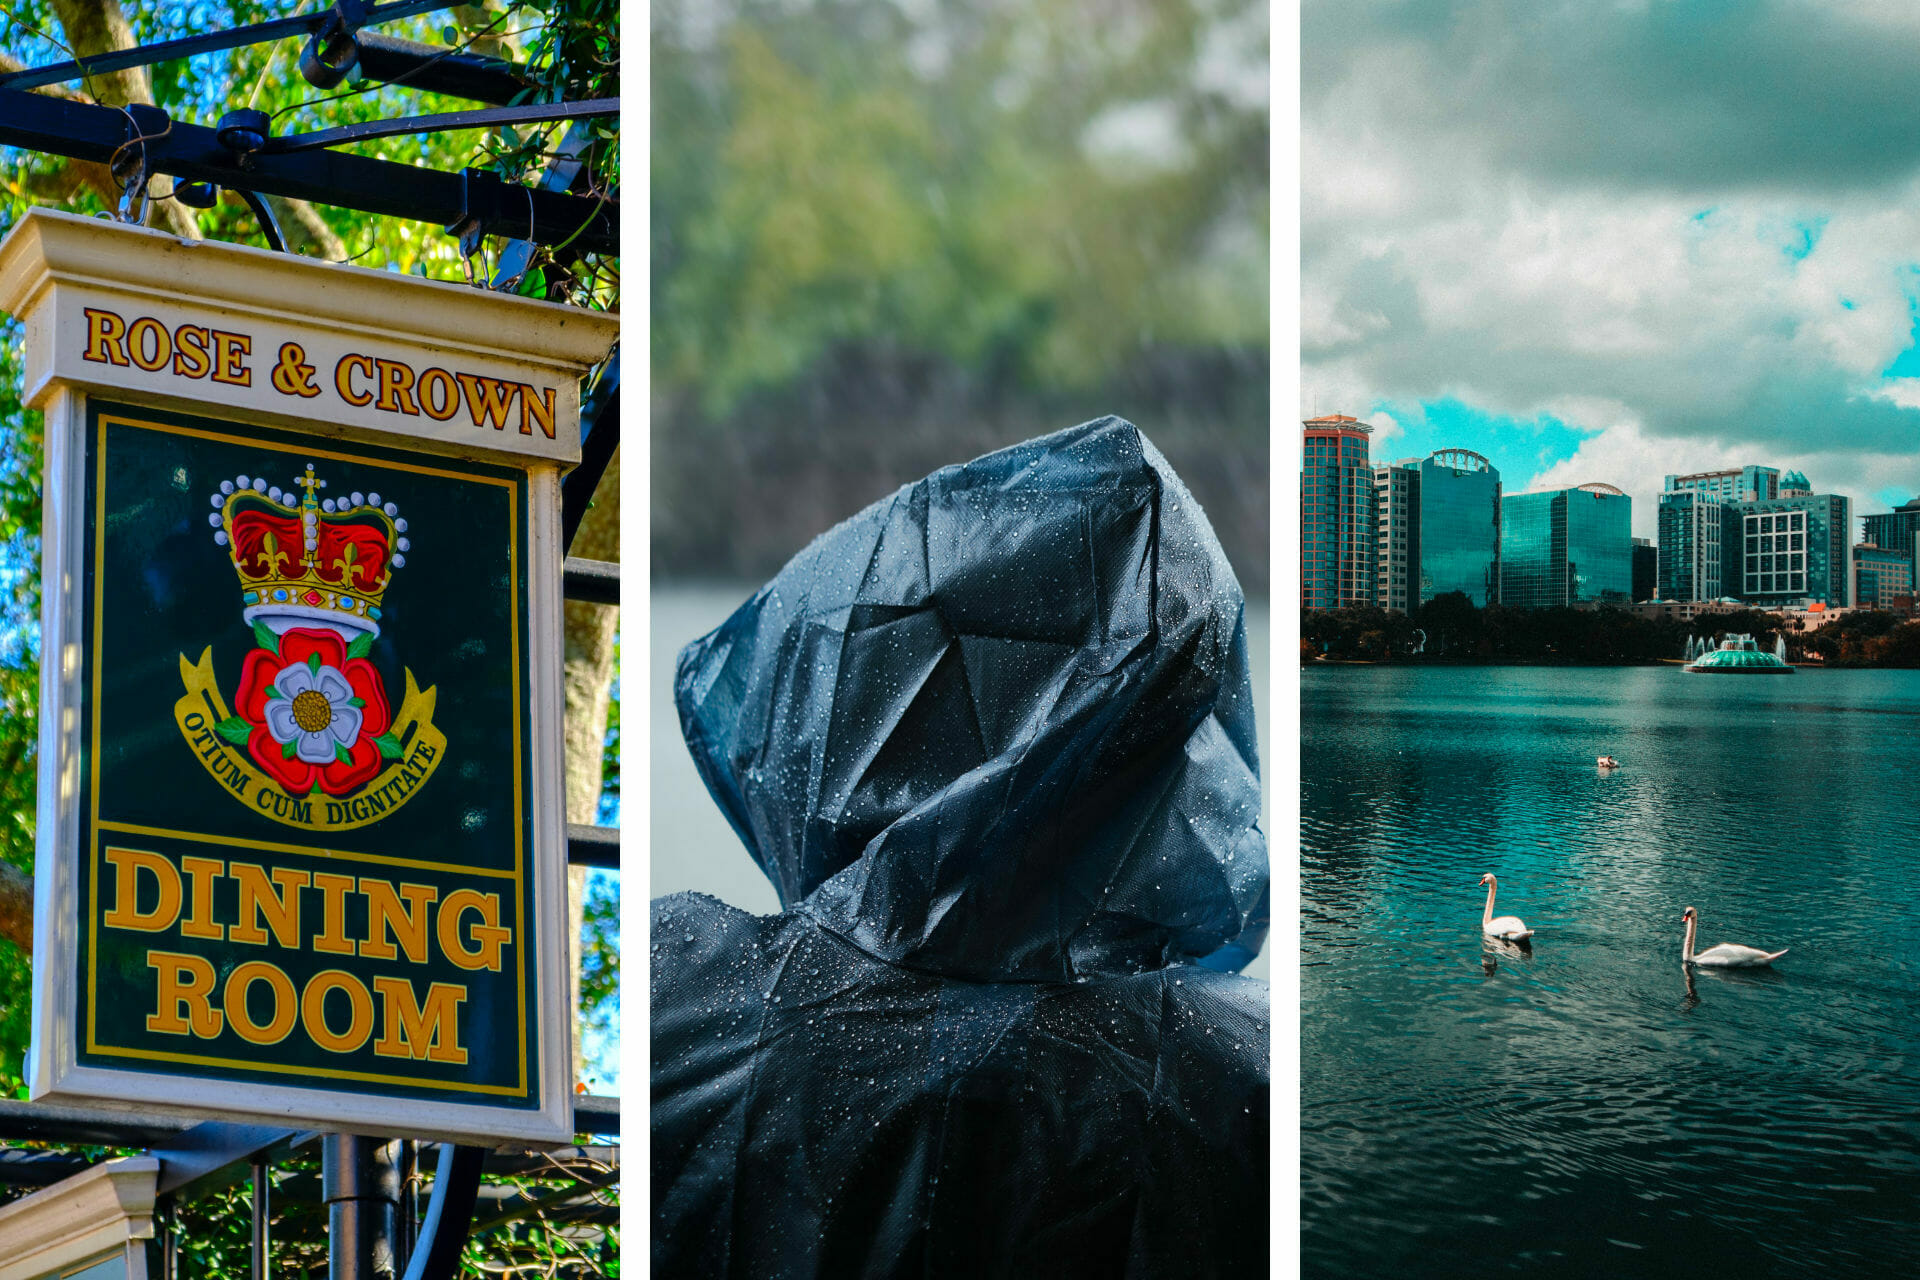 21+ Things to Do on a Rainy Day in Orlando (2021) via @allamericanatlas